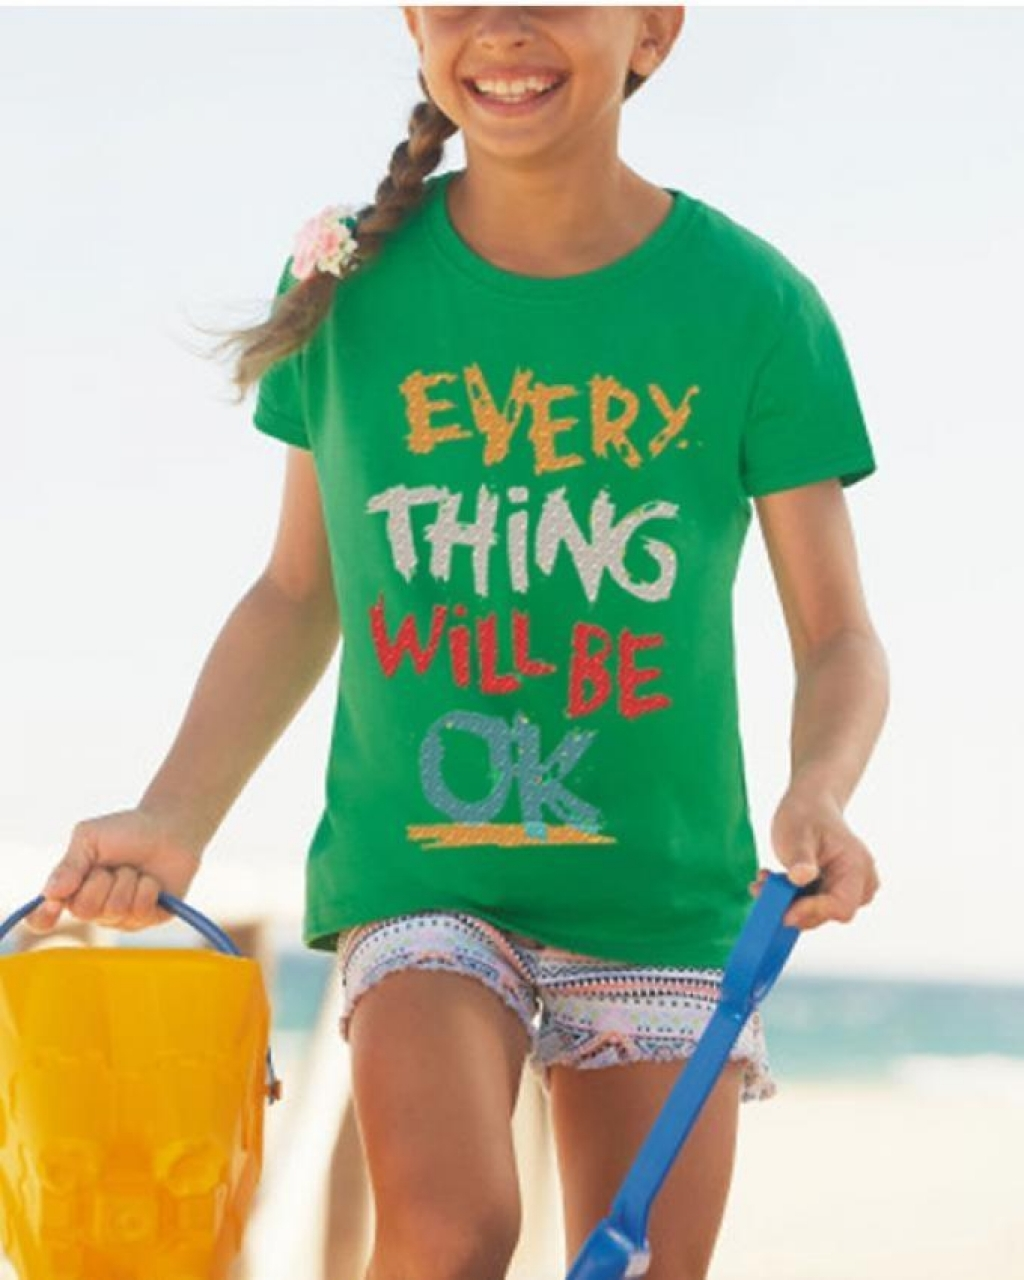 15973047050_t-shirt-design-t-shirt-for-girls-baby-girl-t-shirt-girls-t-shirt-kids-online-shopping-shopping-for-baby-girl-t-shirt-Baby-girl-online-shopping-in-Pakistan.jpg